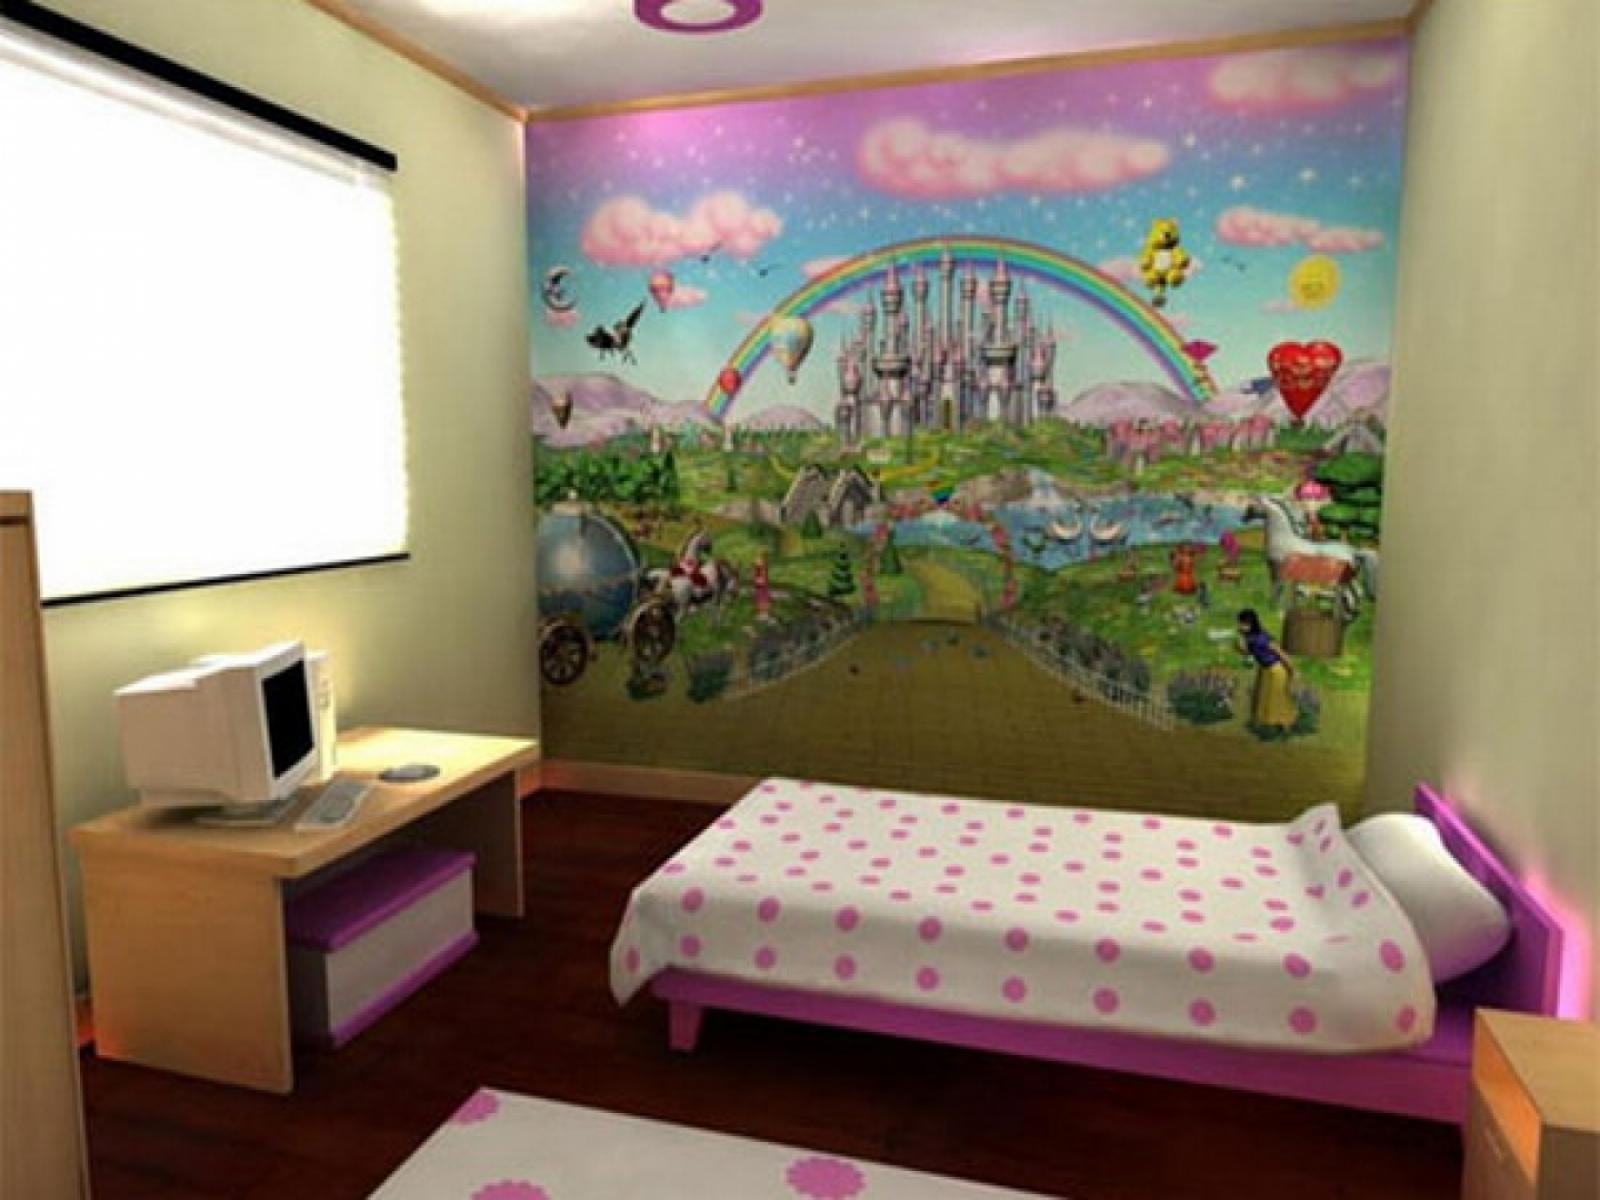 Girls Bedroom Wall Mural - HD Wallpaper